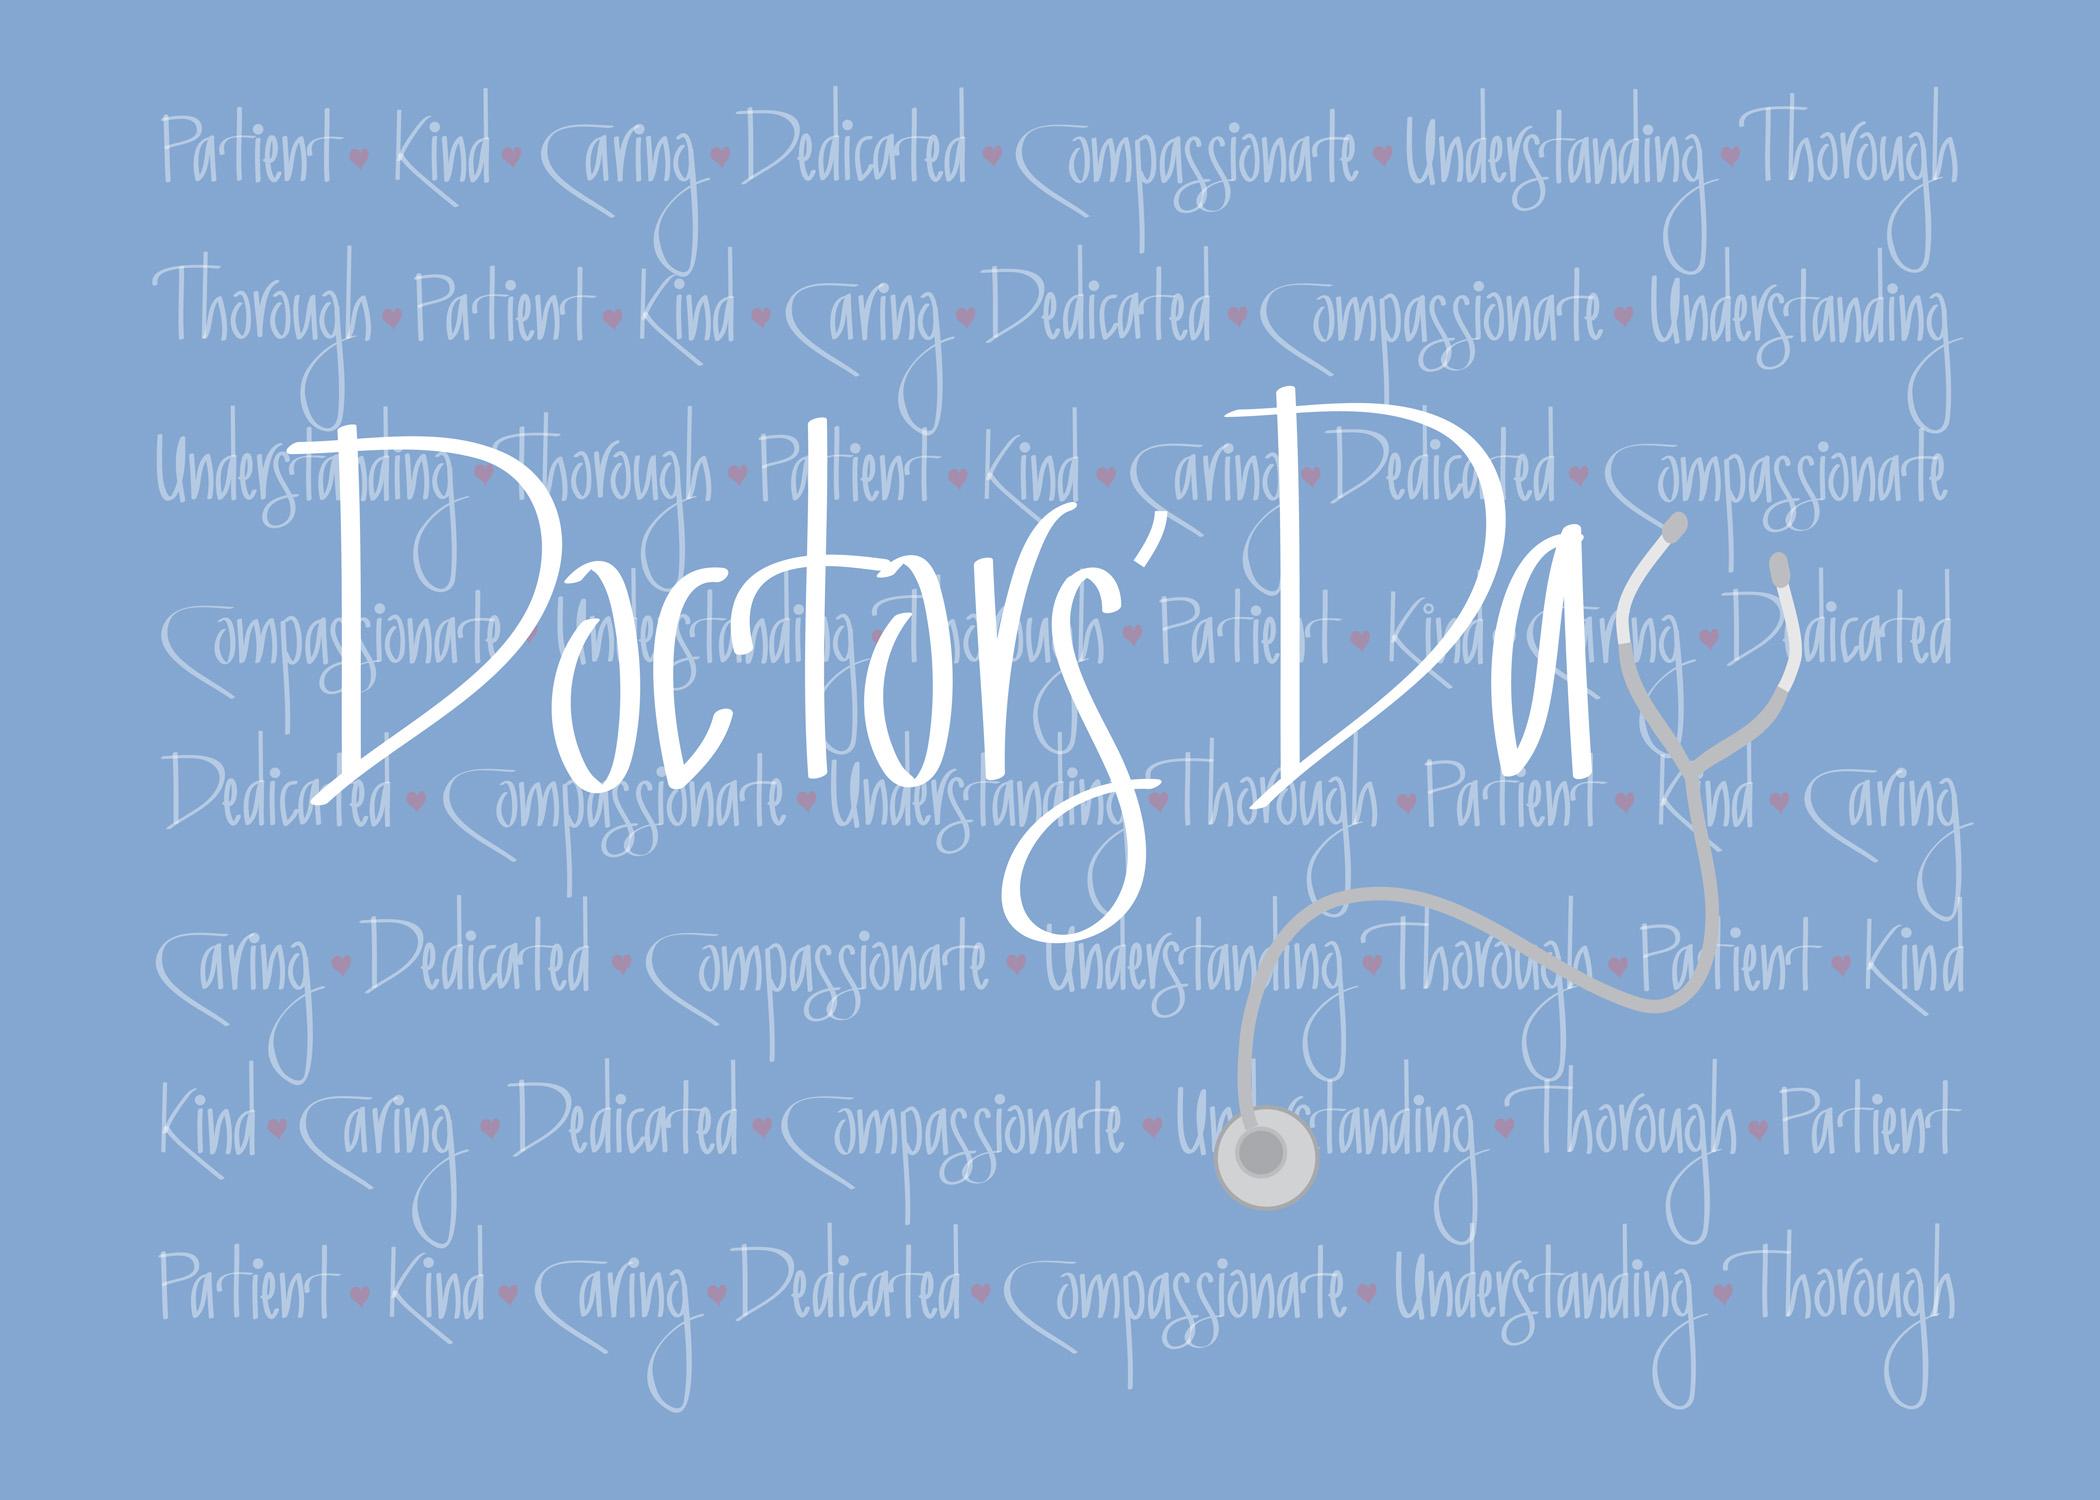 Doctors' Day 2014 redo